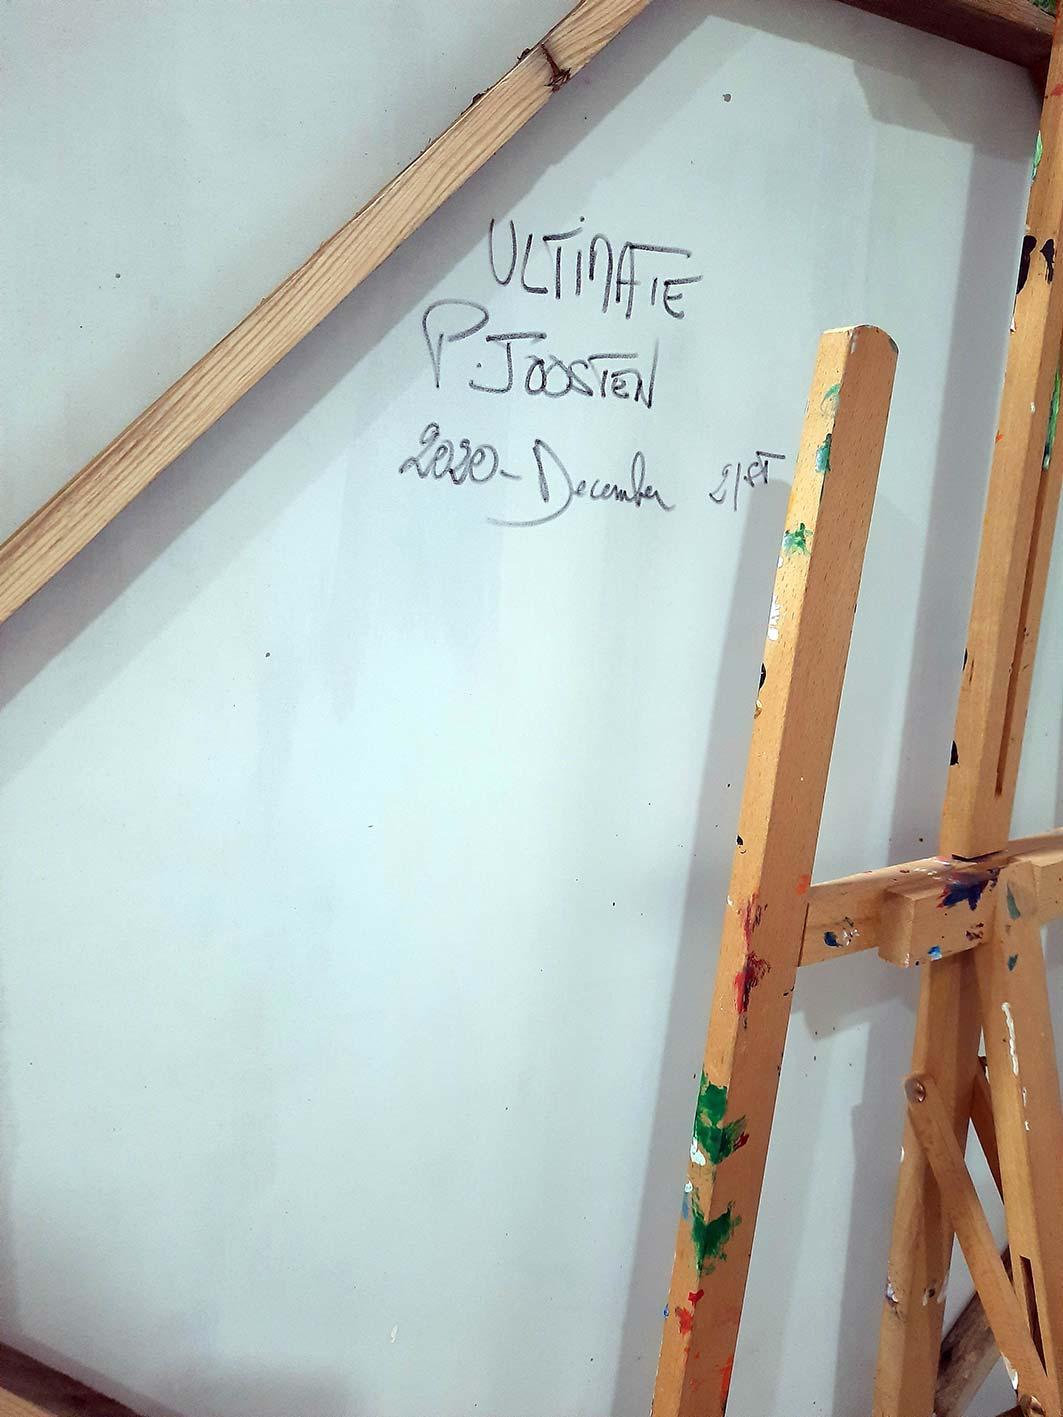 Ultimate-Patrick-Joosten-2020-december-21st-Back-signature